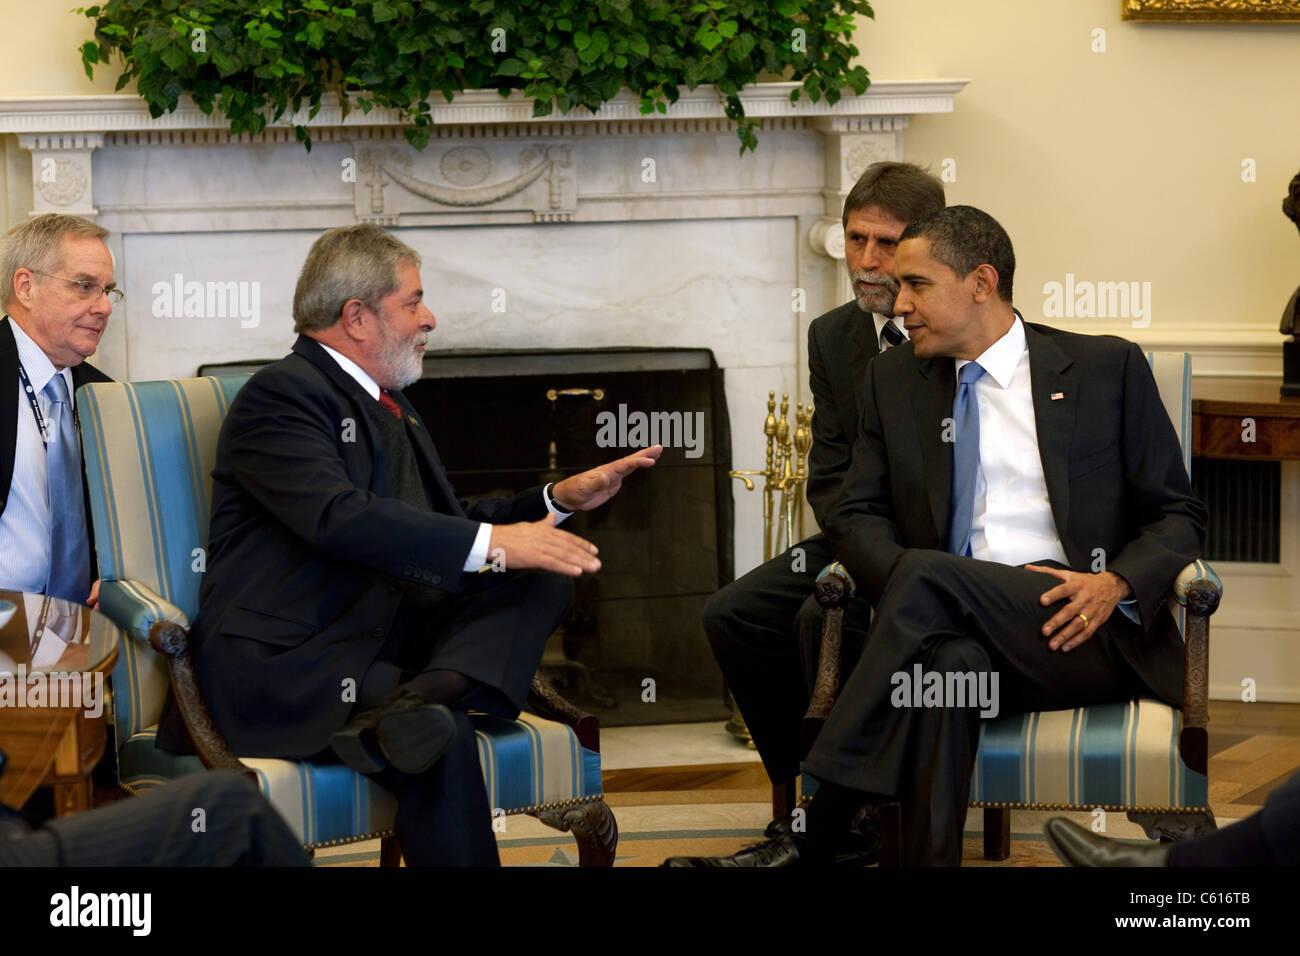 Präsident Obama trifft sich mit Präsident Lula da Silva aus Brasilien im Oval Office. 14. März 2009. Stockbild